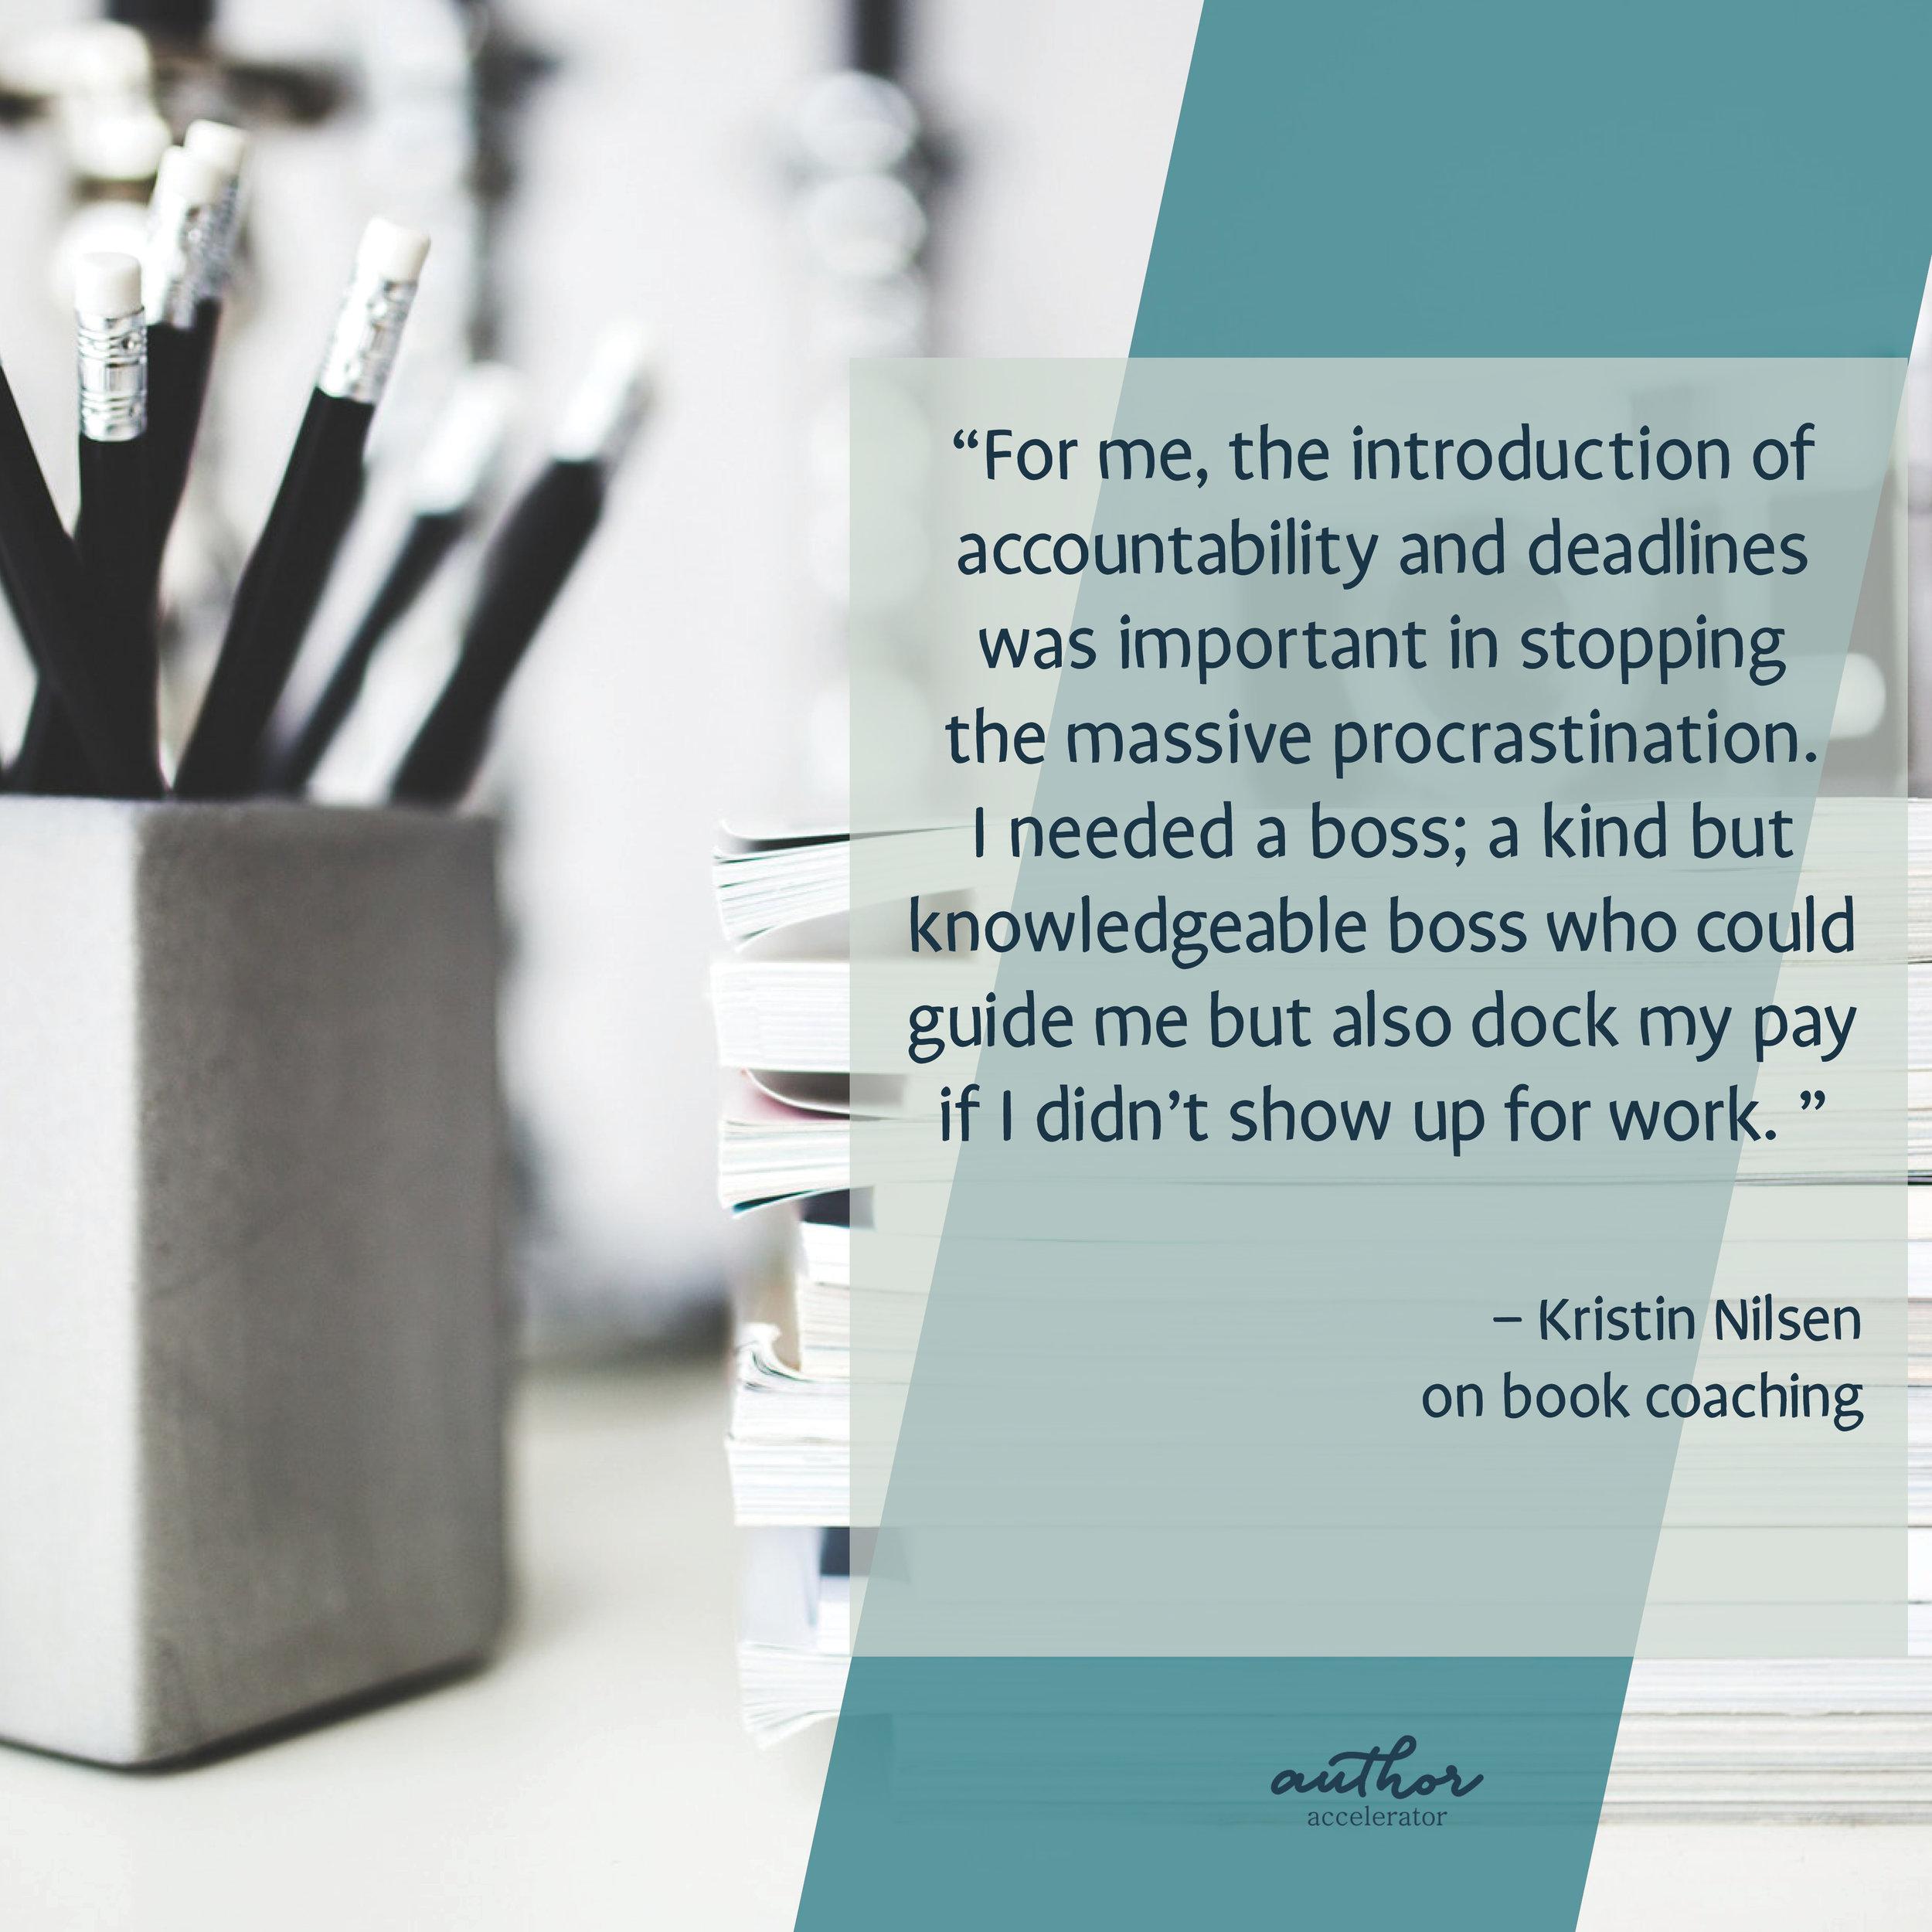 book_coaching_kristin_nilsen.jpg